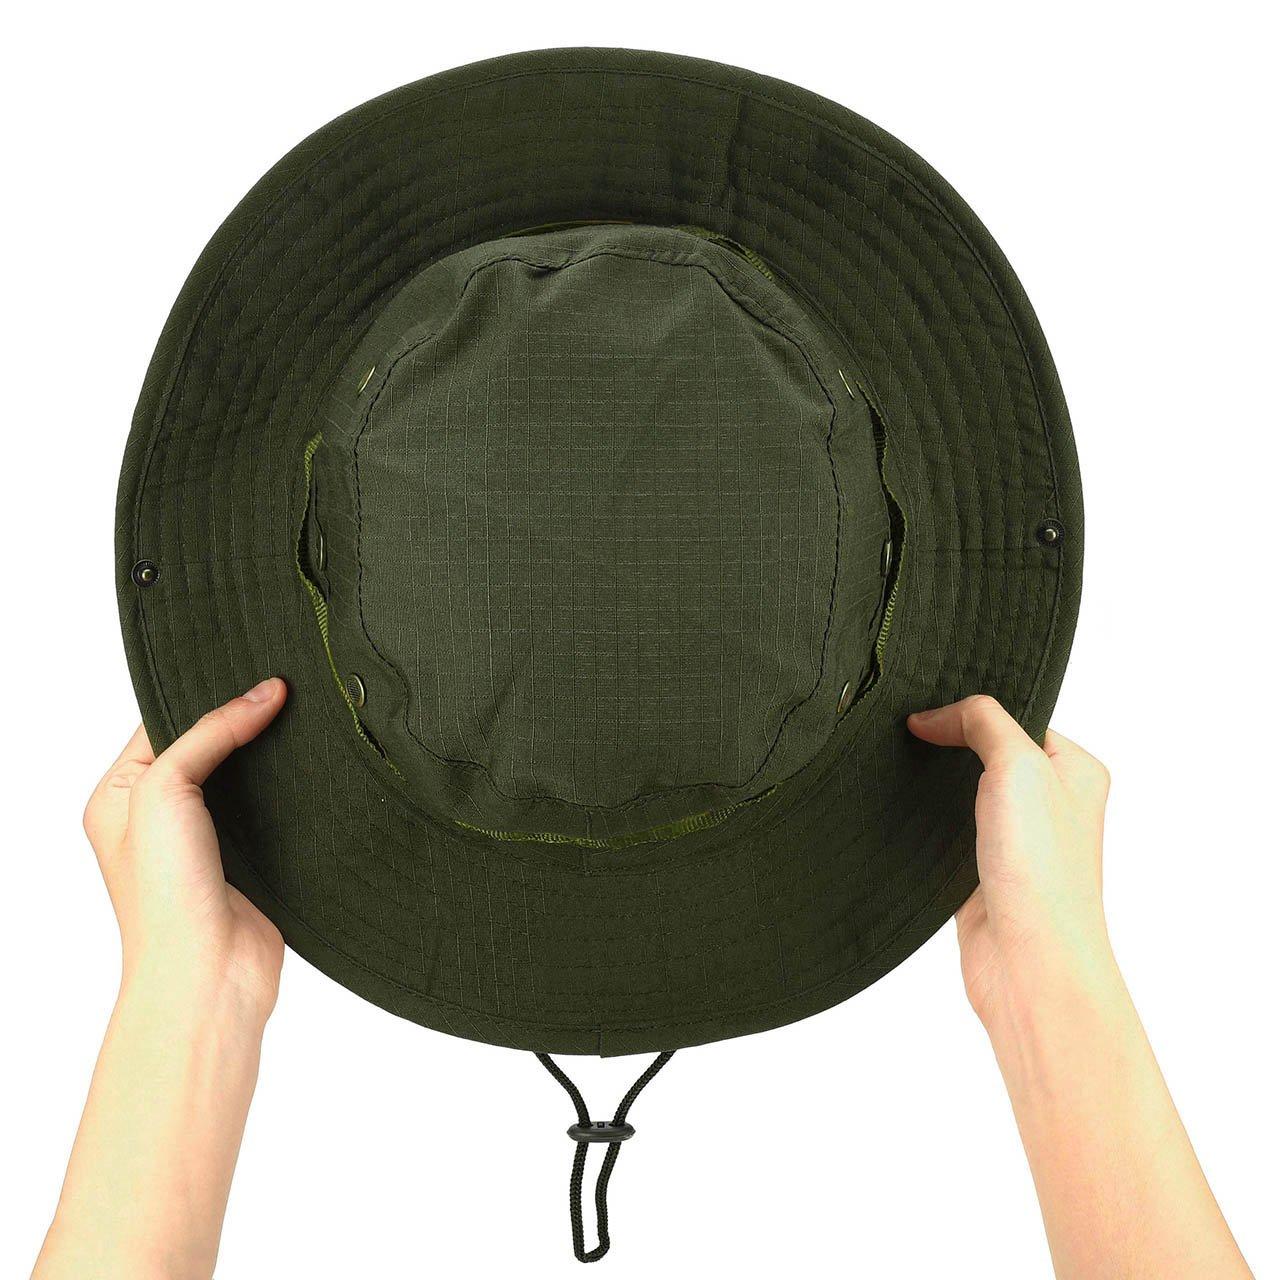 17b4e08e0 FALETO Outdoor Boonie Hat Wide Brim Breathable Safari Fishing Hats UV  Protection Foldable Military Cap